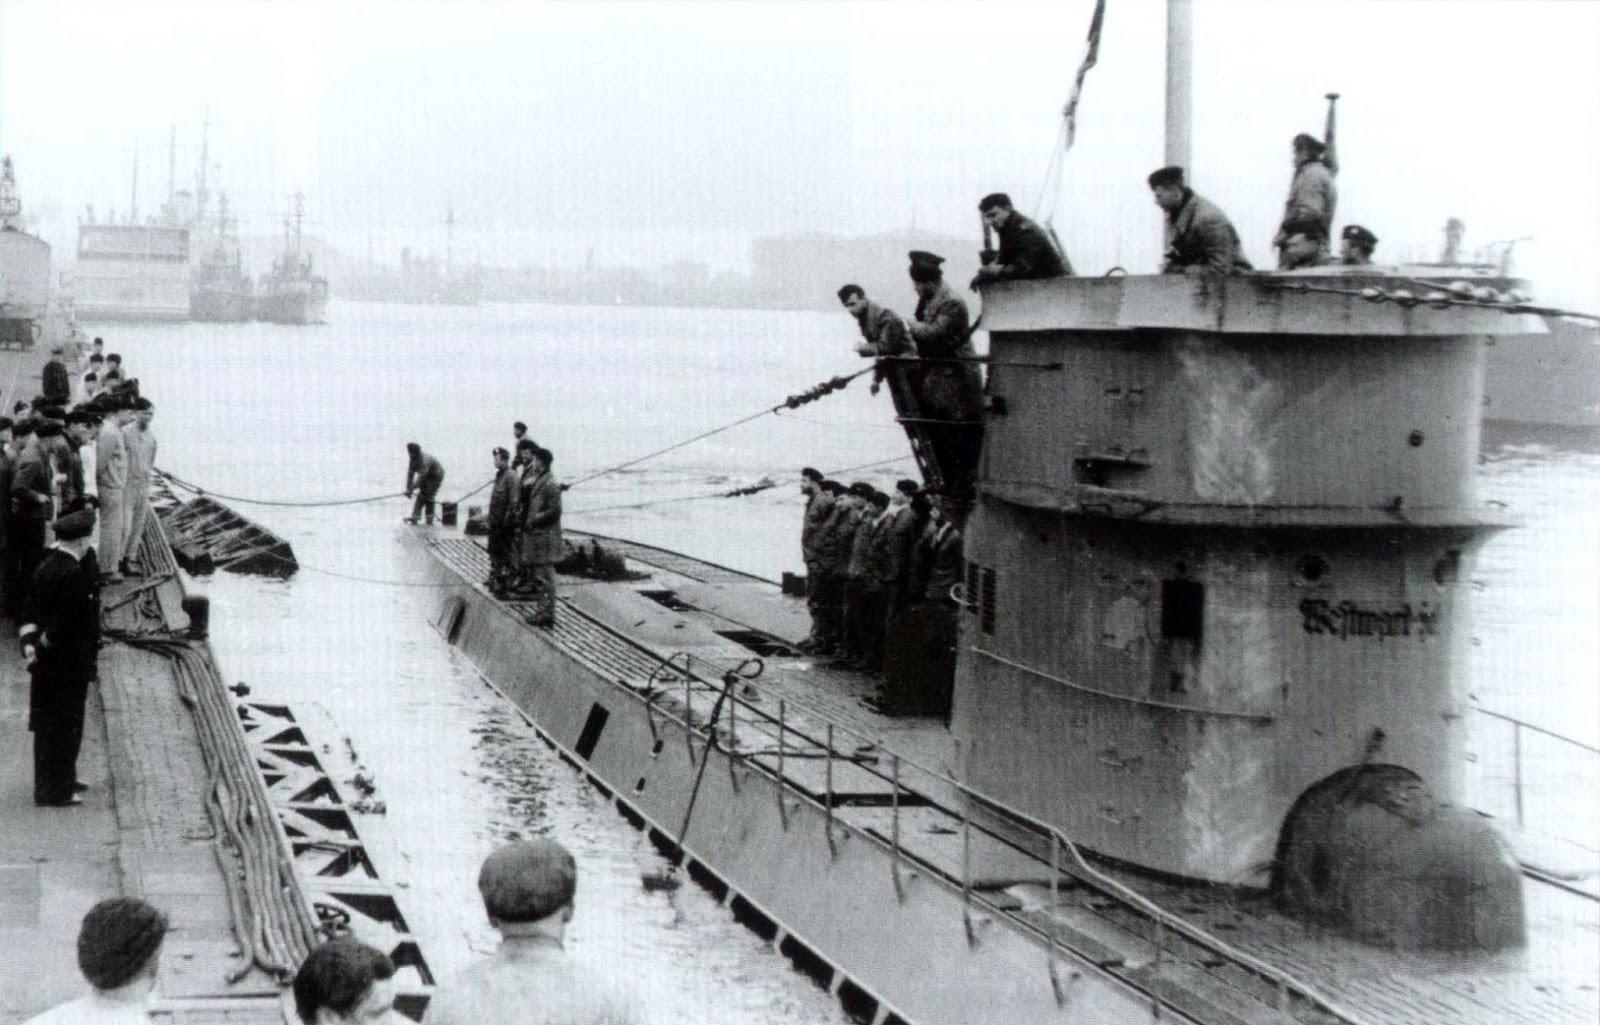 14+u-37+u-boat+base+wilhelmshaven+patrol+werner+hartmann+westward-ho ...